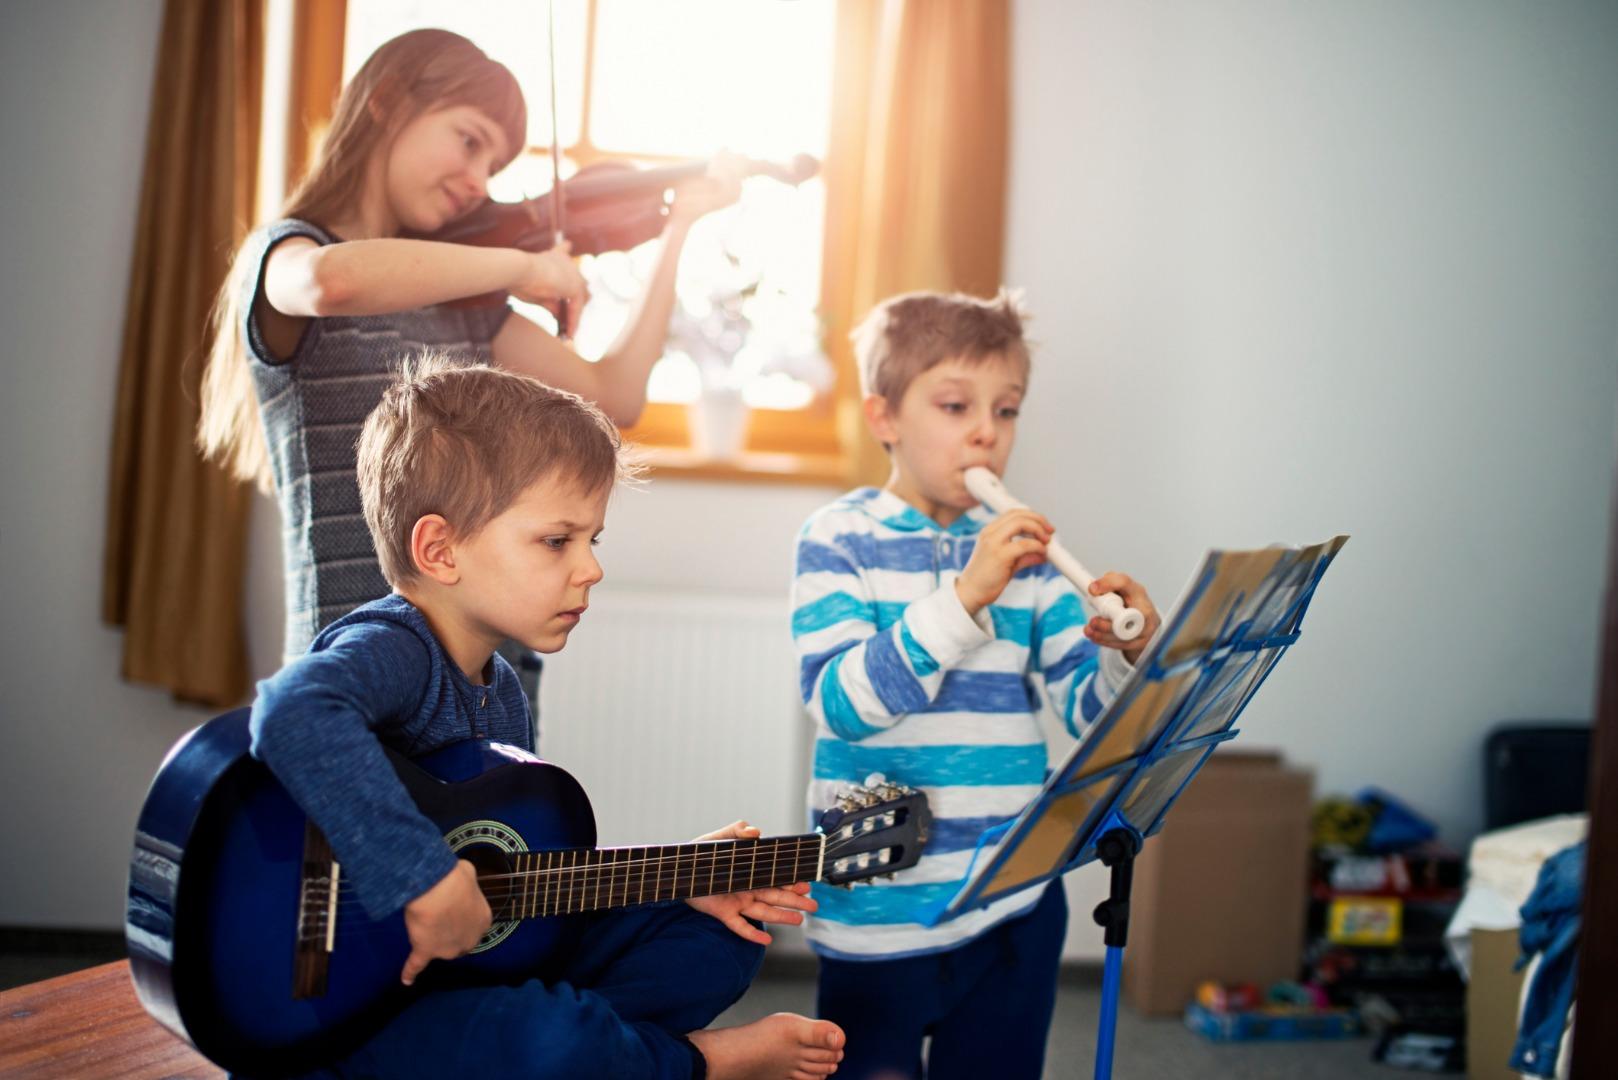 Music school: the nuances of choice